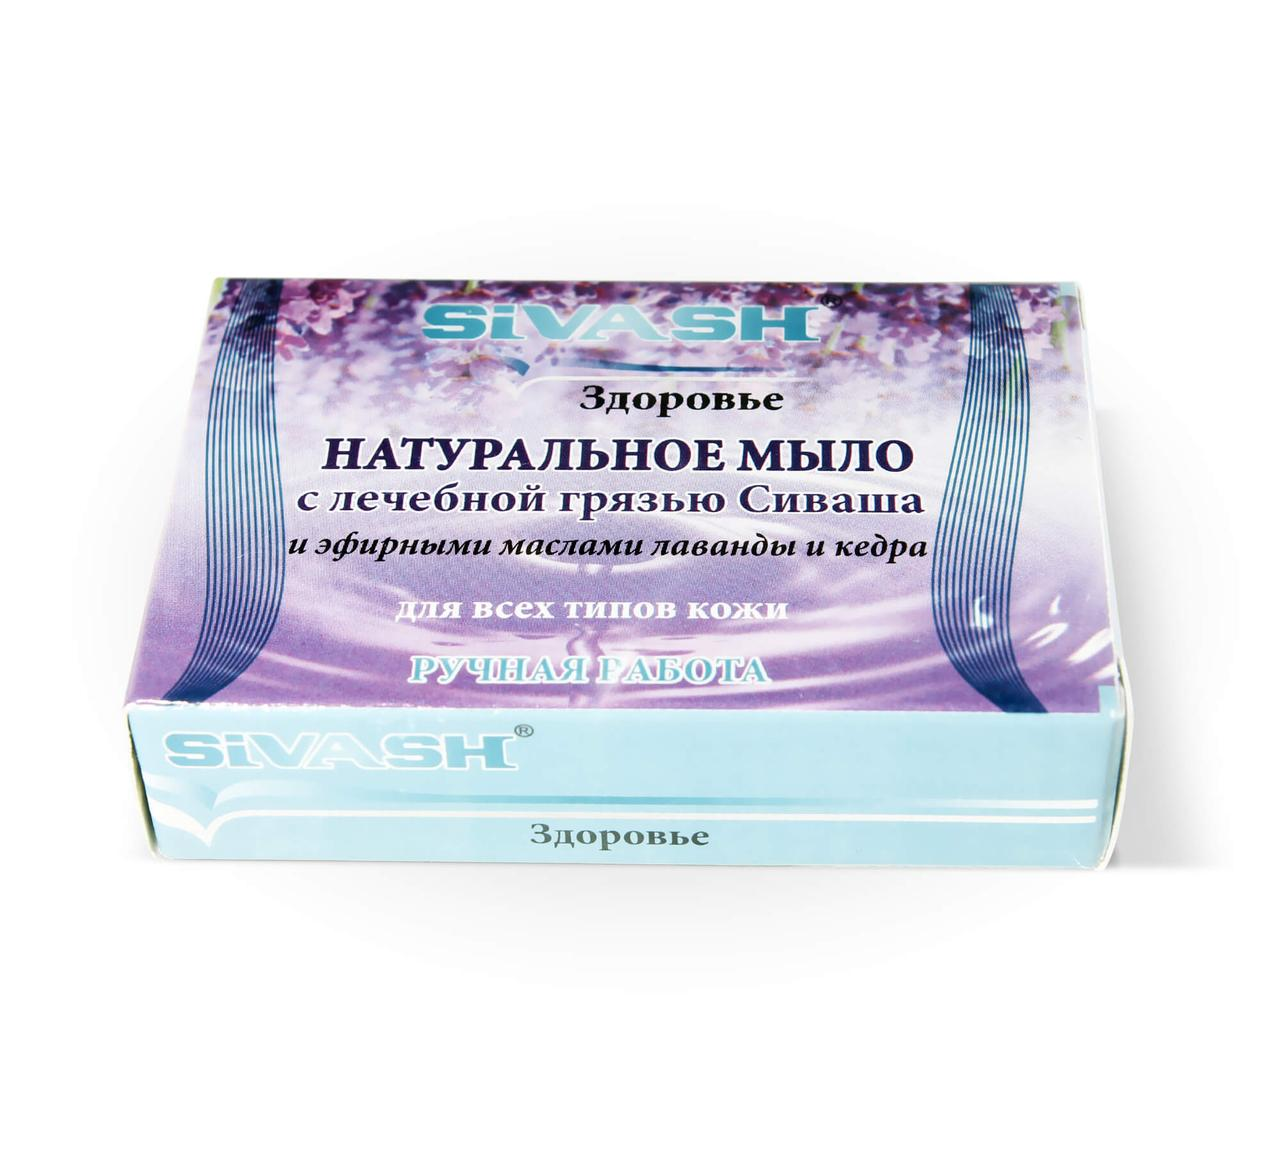 Натуральное мыло Сиваш, лаванда, кедр.